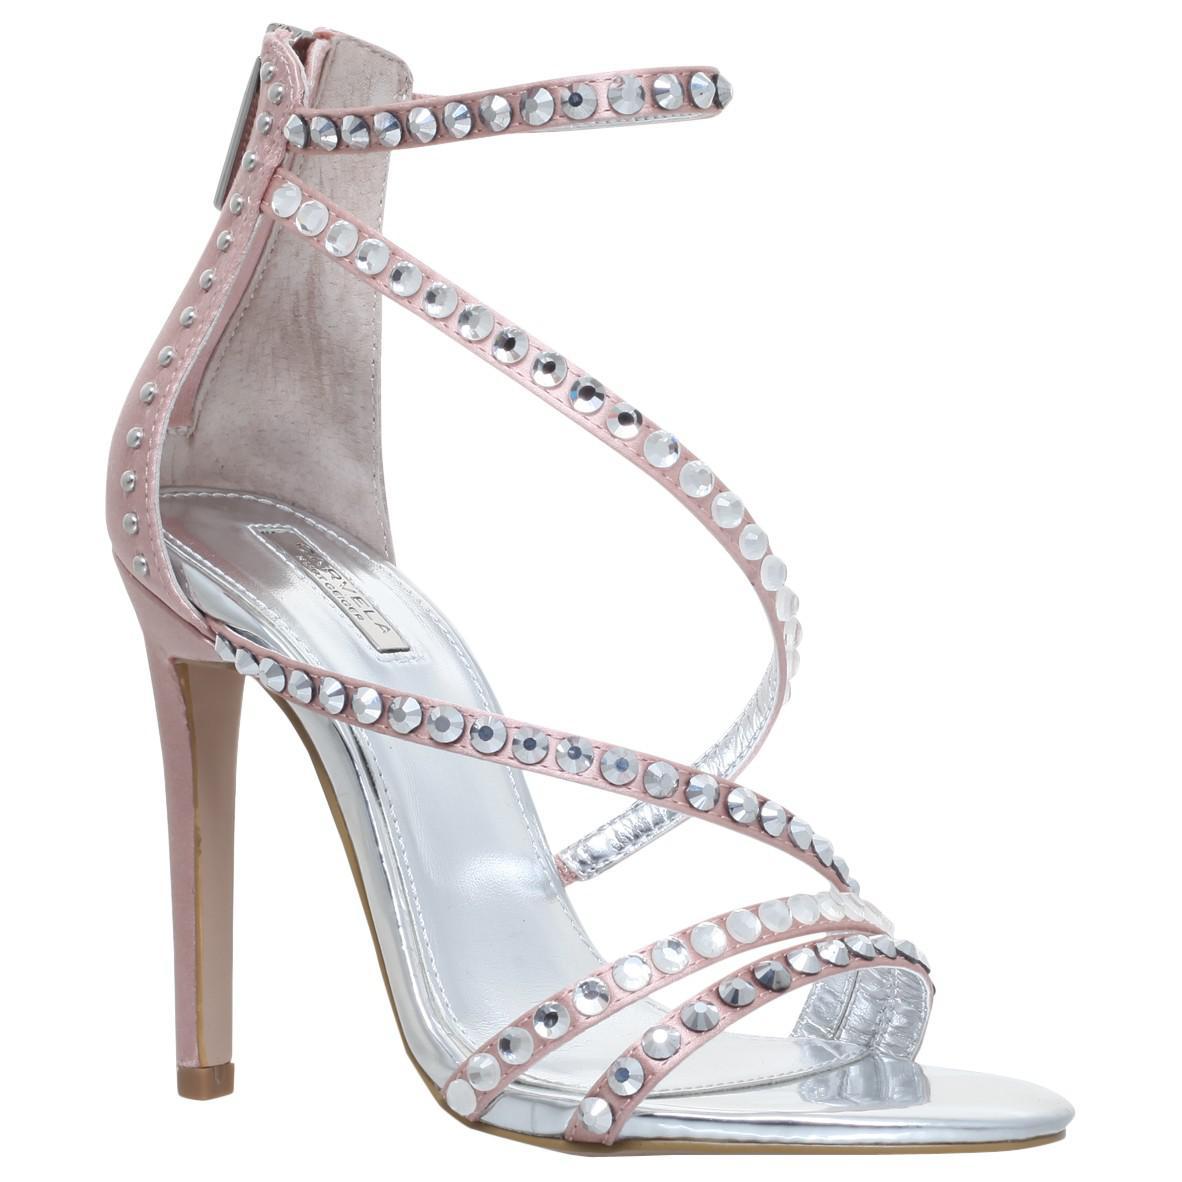 e98f7c6c394 Kurt Geiger Carvela Grass Embellished Stiletto Heeled Sandals - Lyst